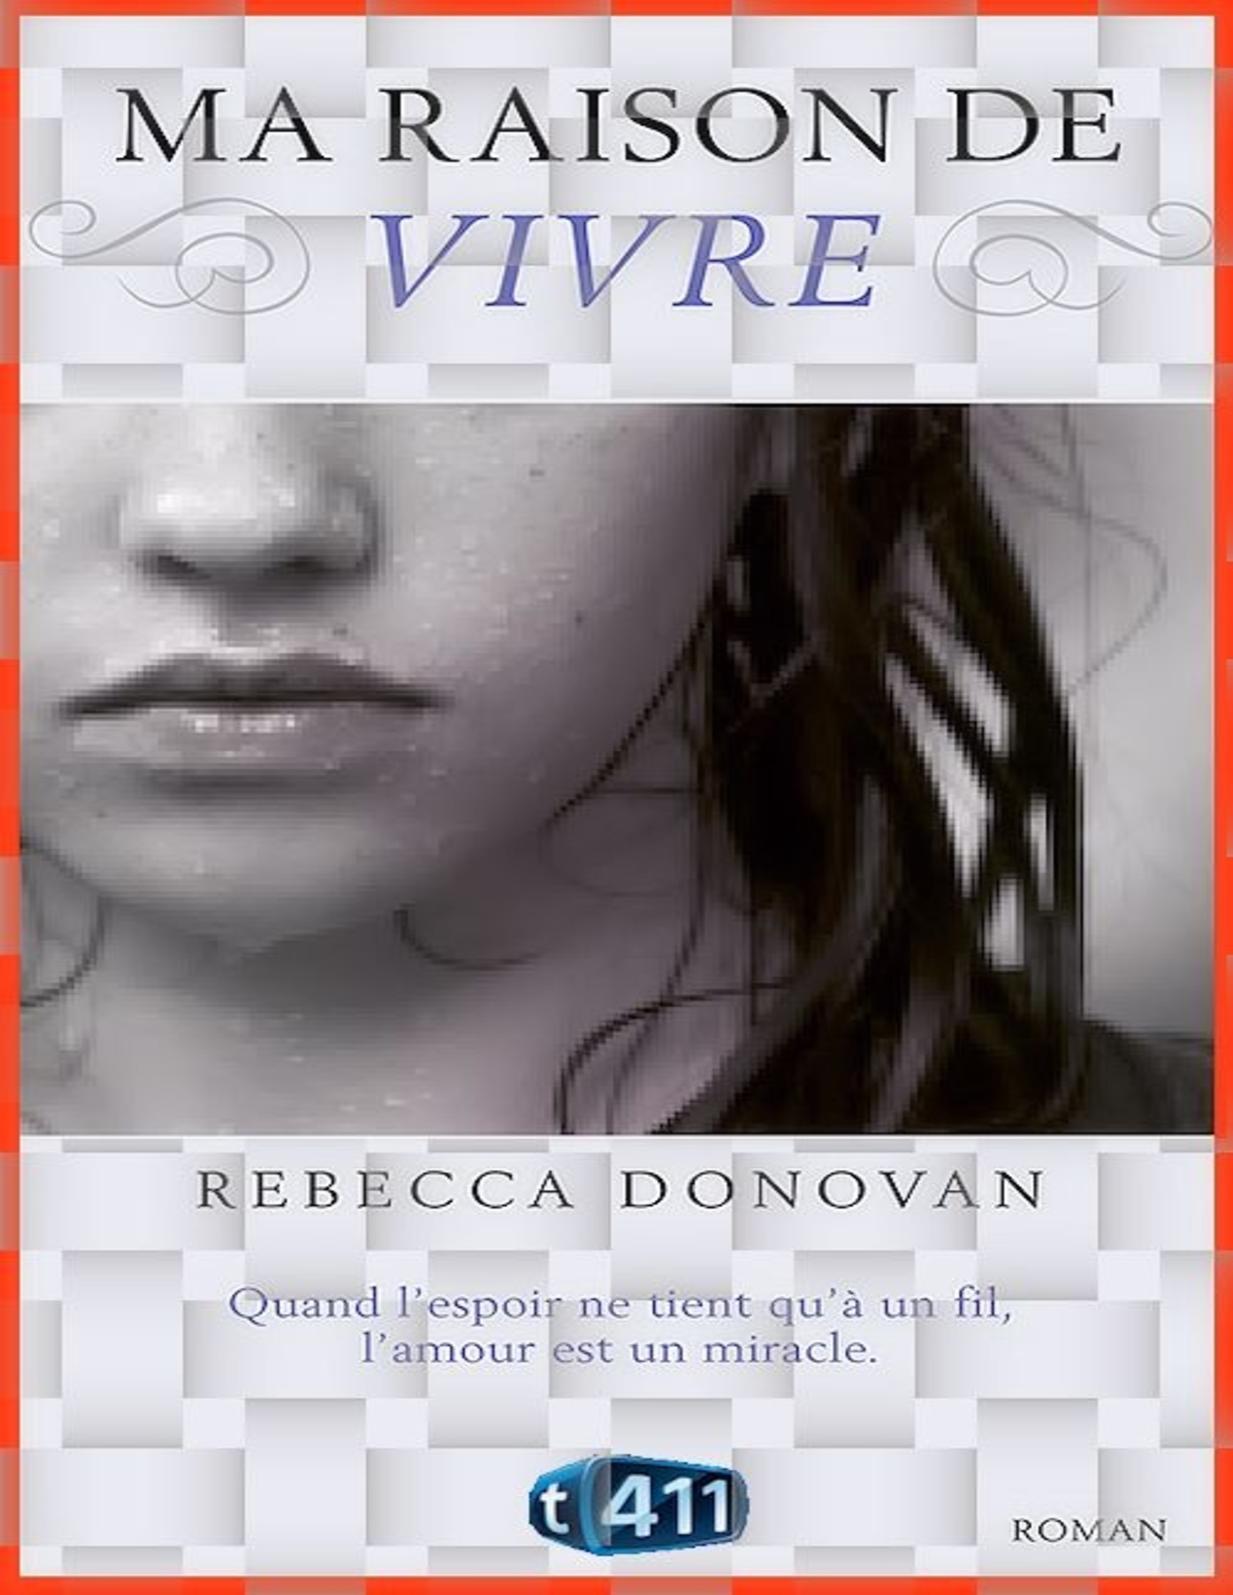 Ma De Calaméo Rebecca Raison Vivre Donovan Ebook Gratuit HWIe9YbD2E